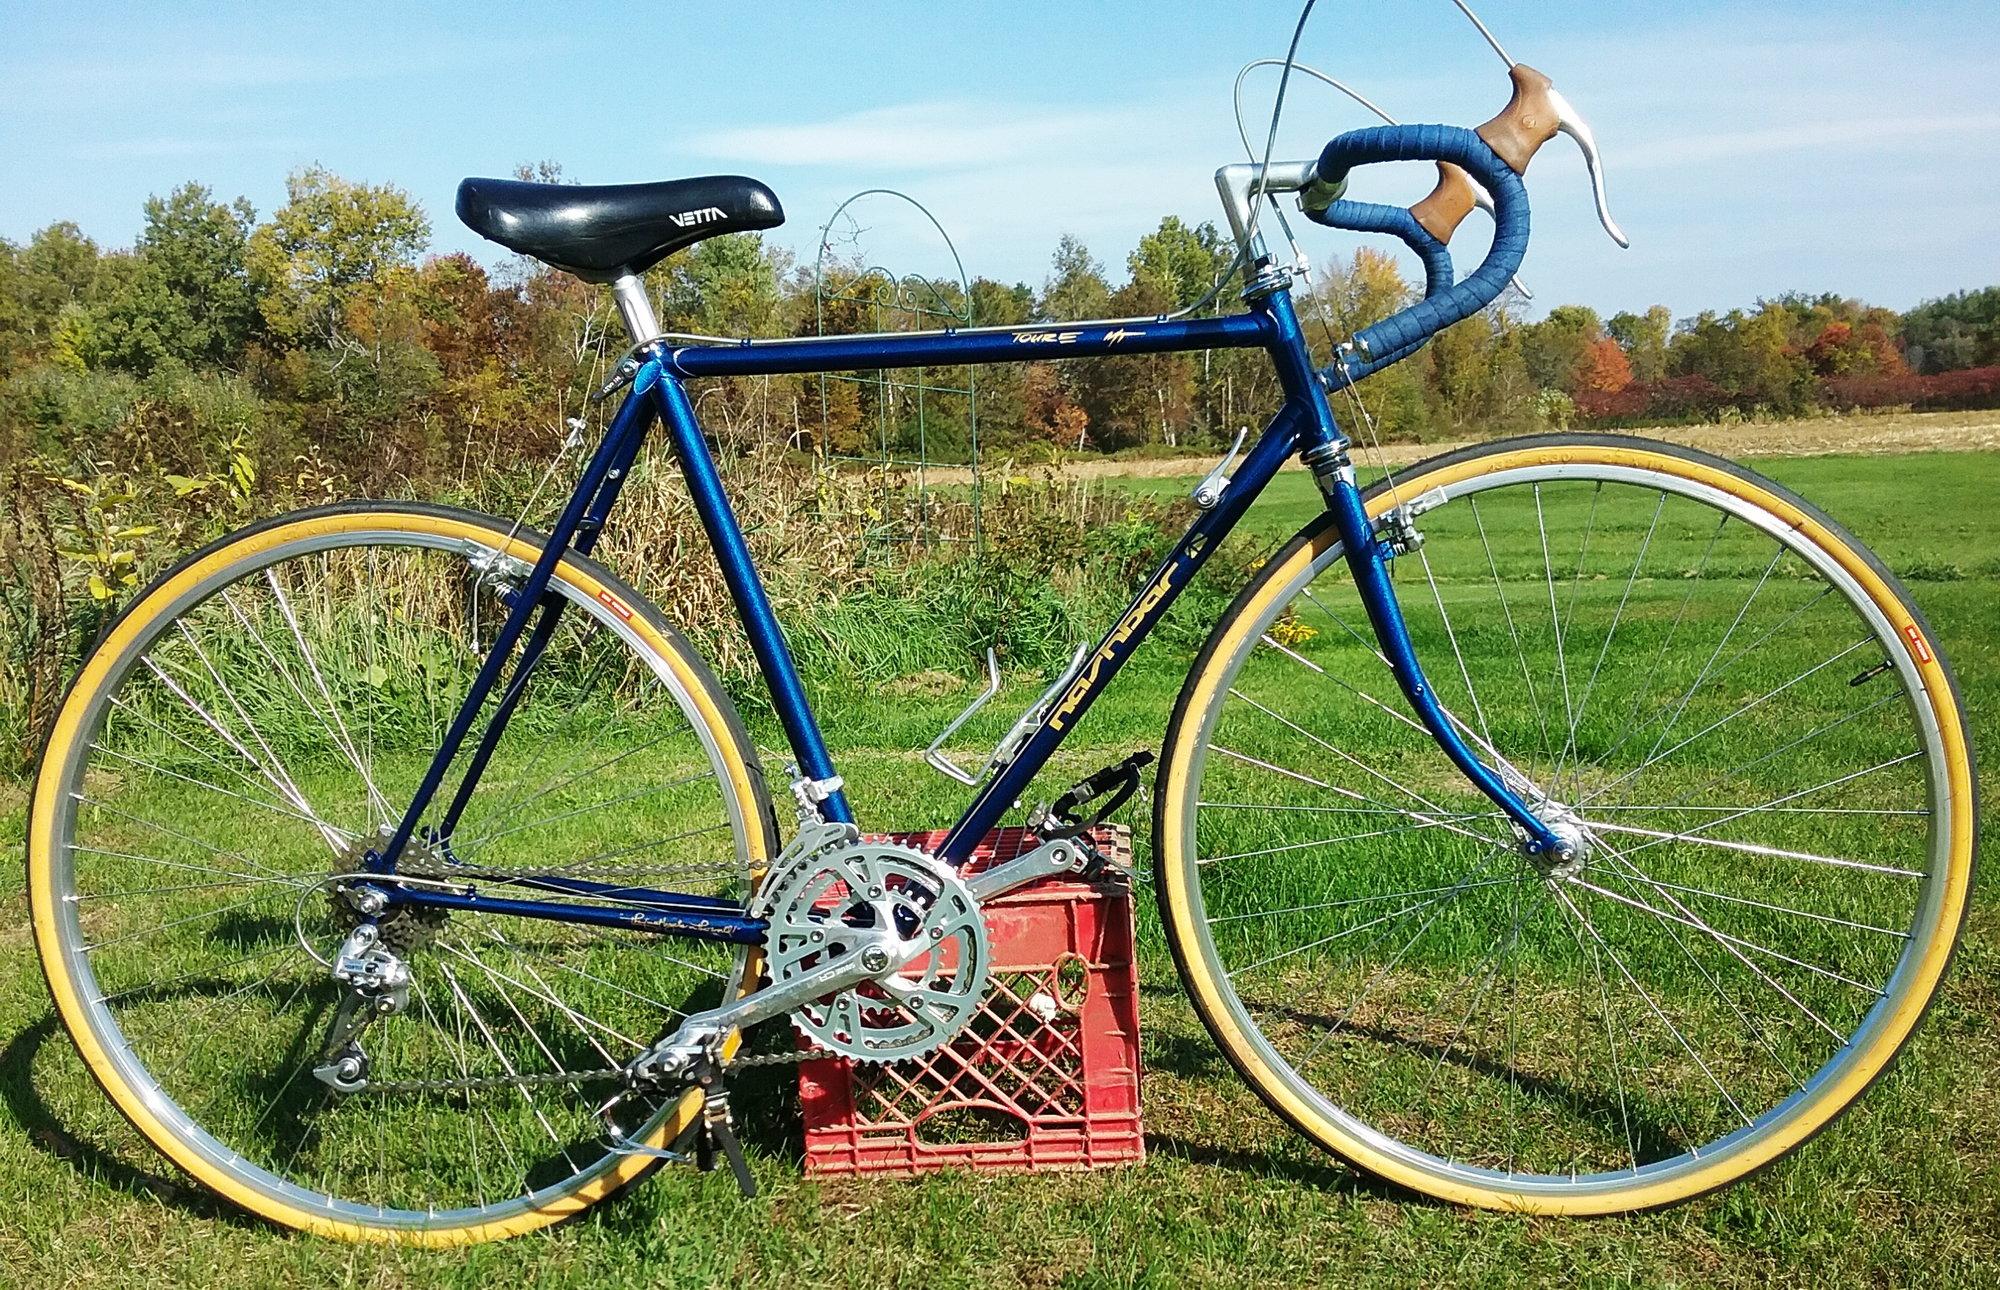 Heavy Duty Bike Steel Seatpost Black 25.0mm Cruiser BMX Lowrider Bicycle NEW!